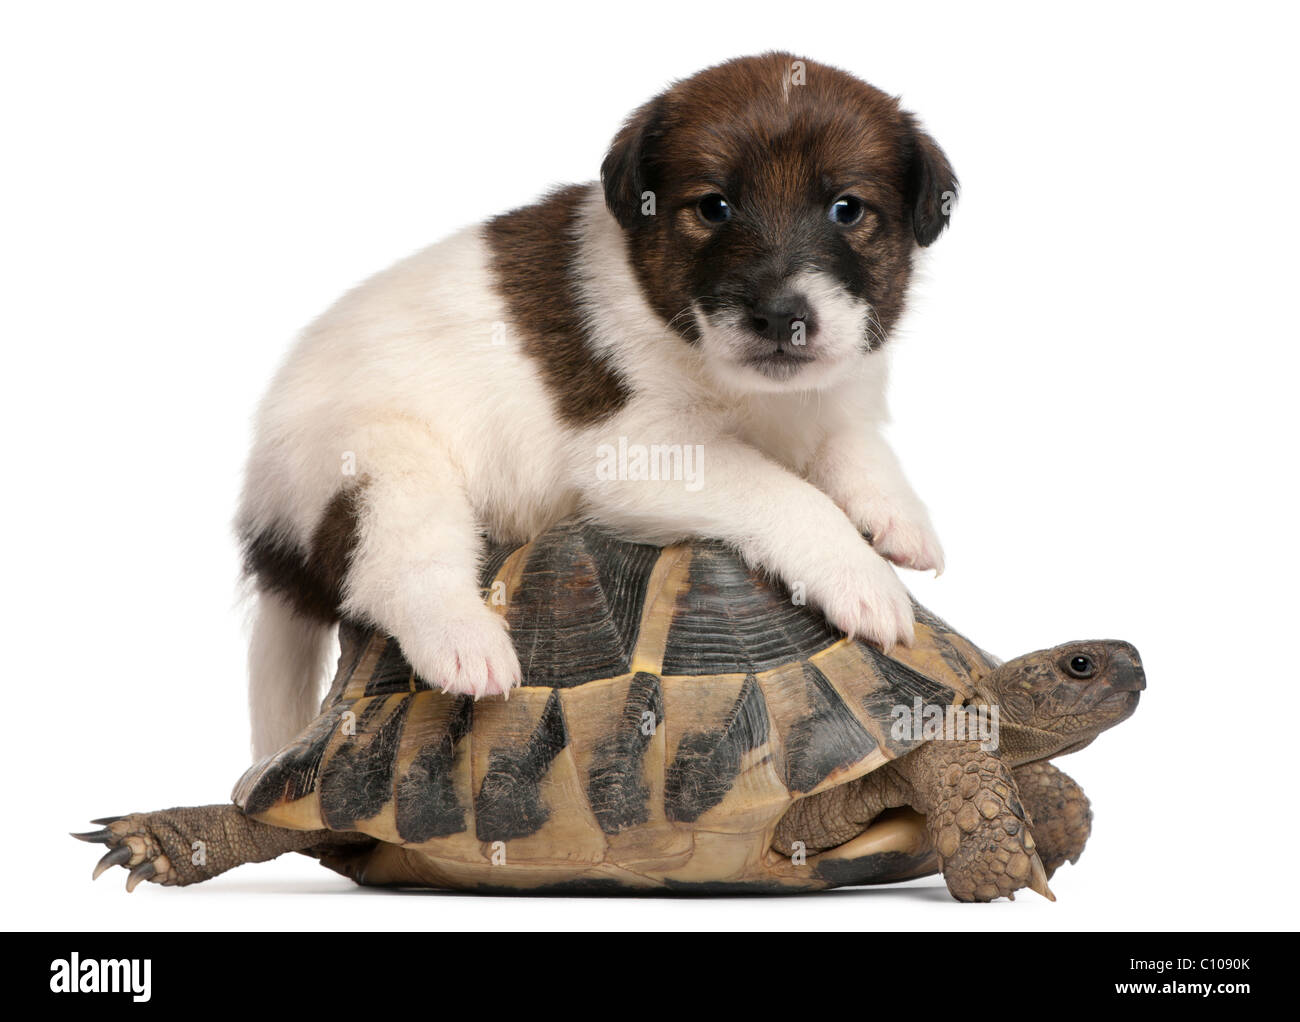 The Fox Terrier Dog Stockfotos & The Fox Terrier Dog Bilder - Alamy